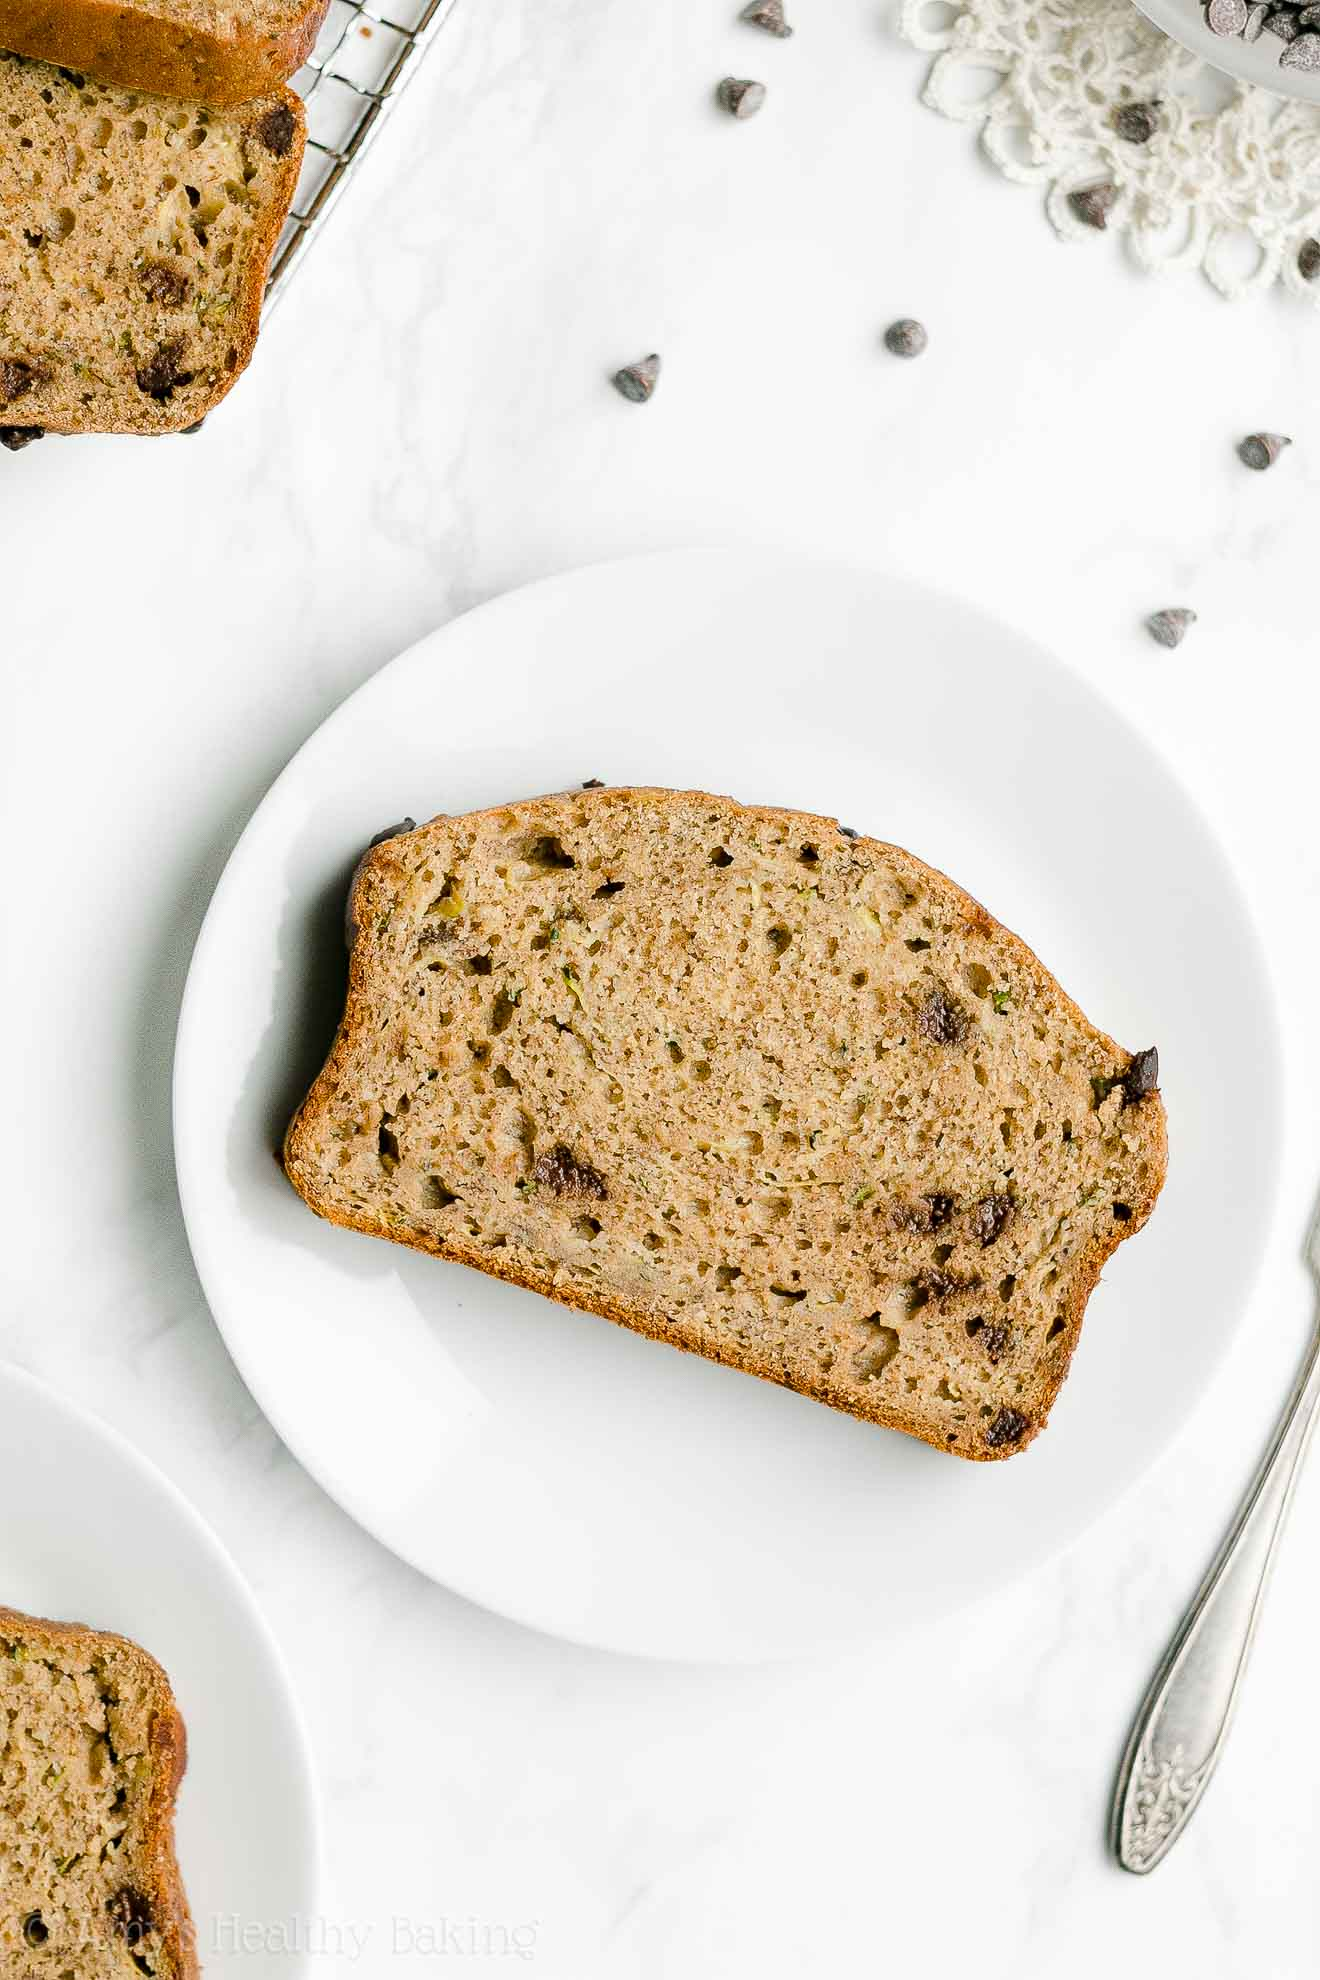 Easy Healthy Whole Wheat No Sugar Chocolate Chip Zucchini Banana Bread